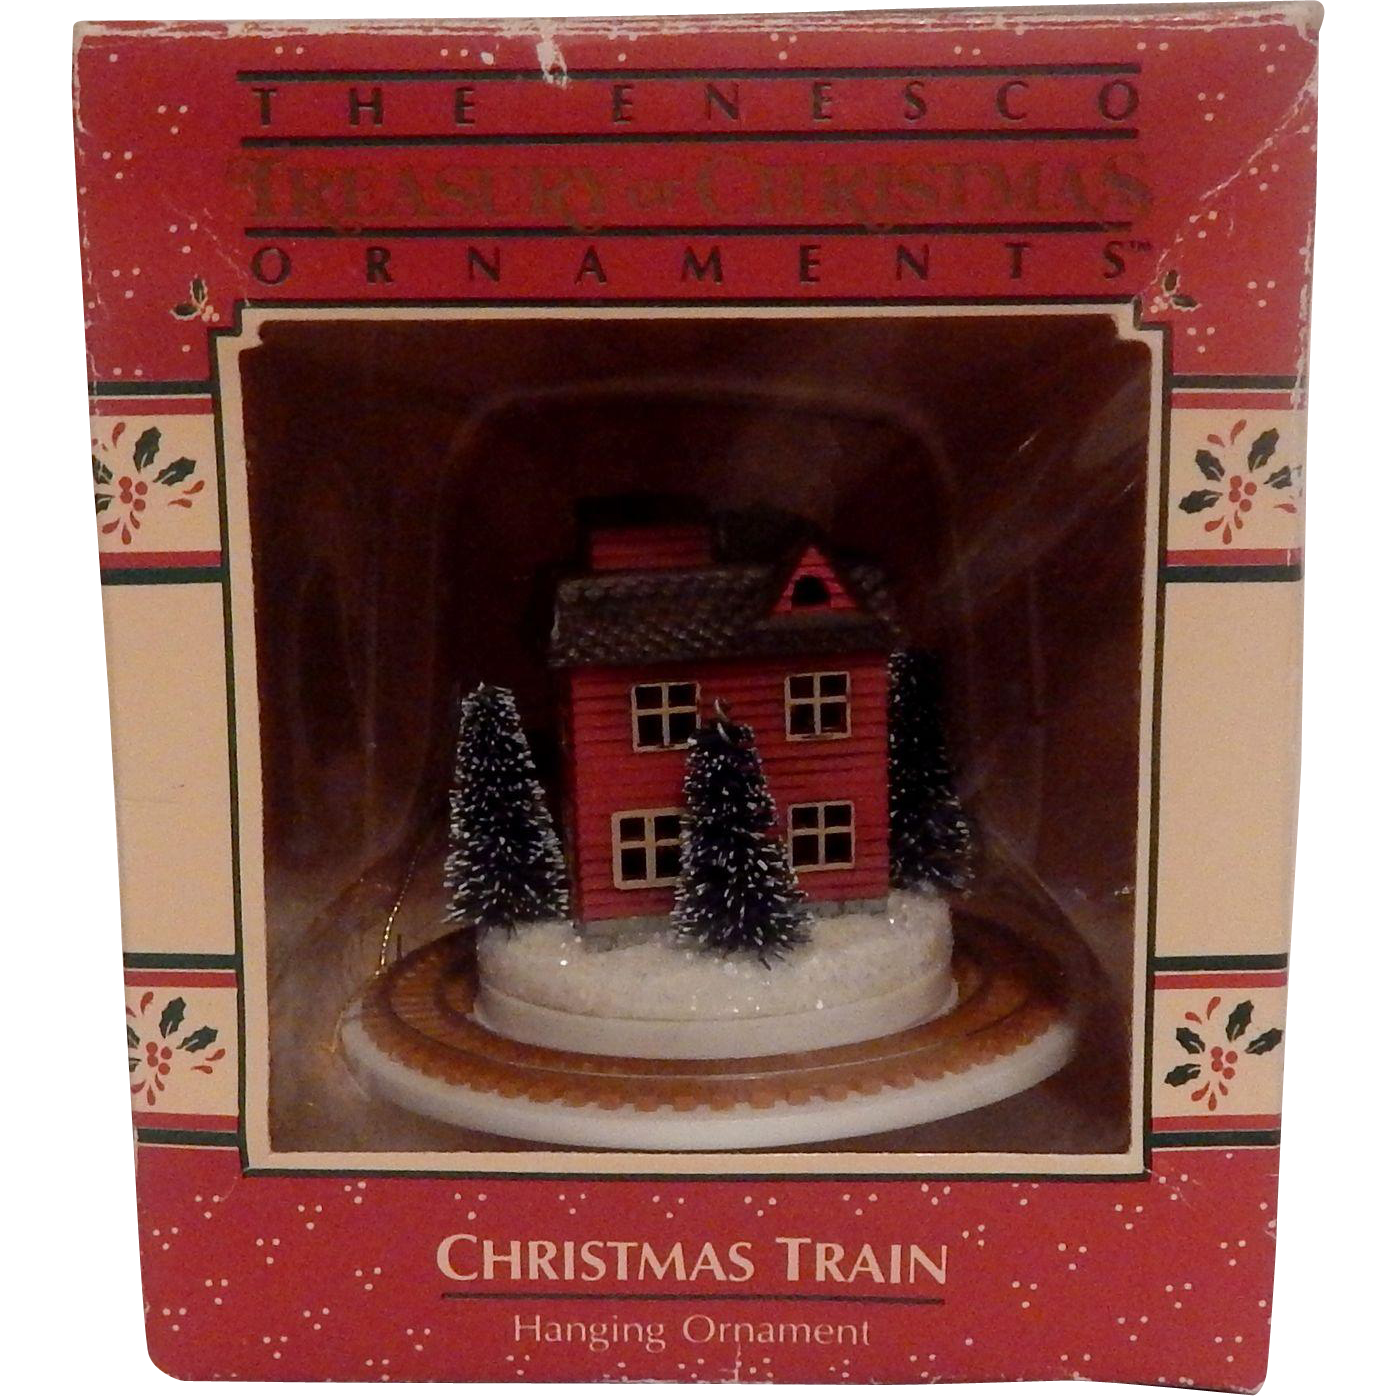 1988 Enesco Christmas Train Hanging Ornament